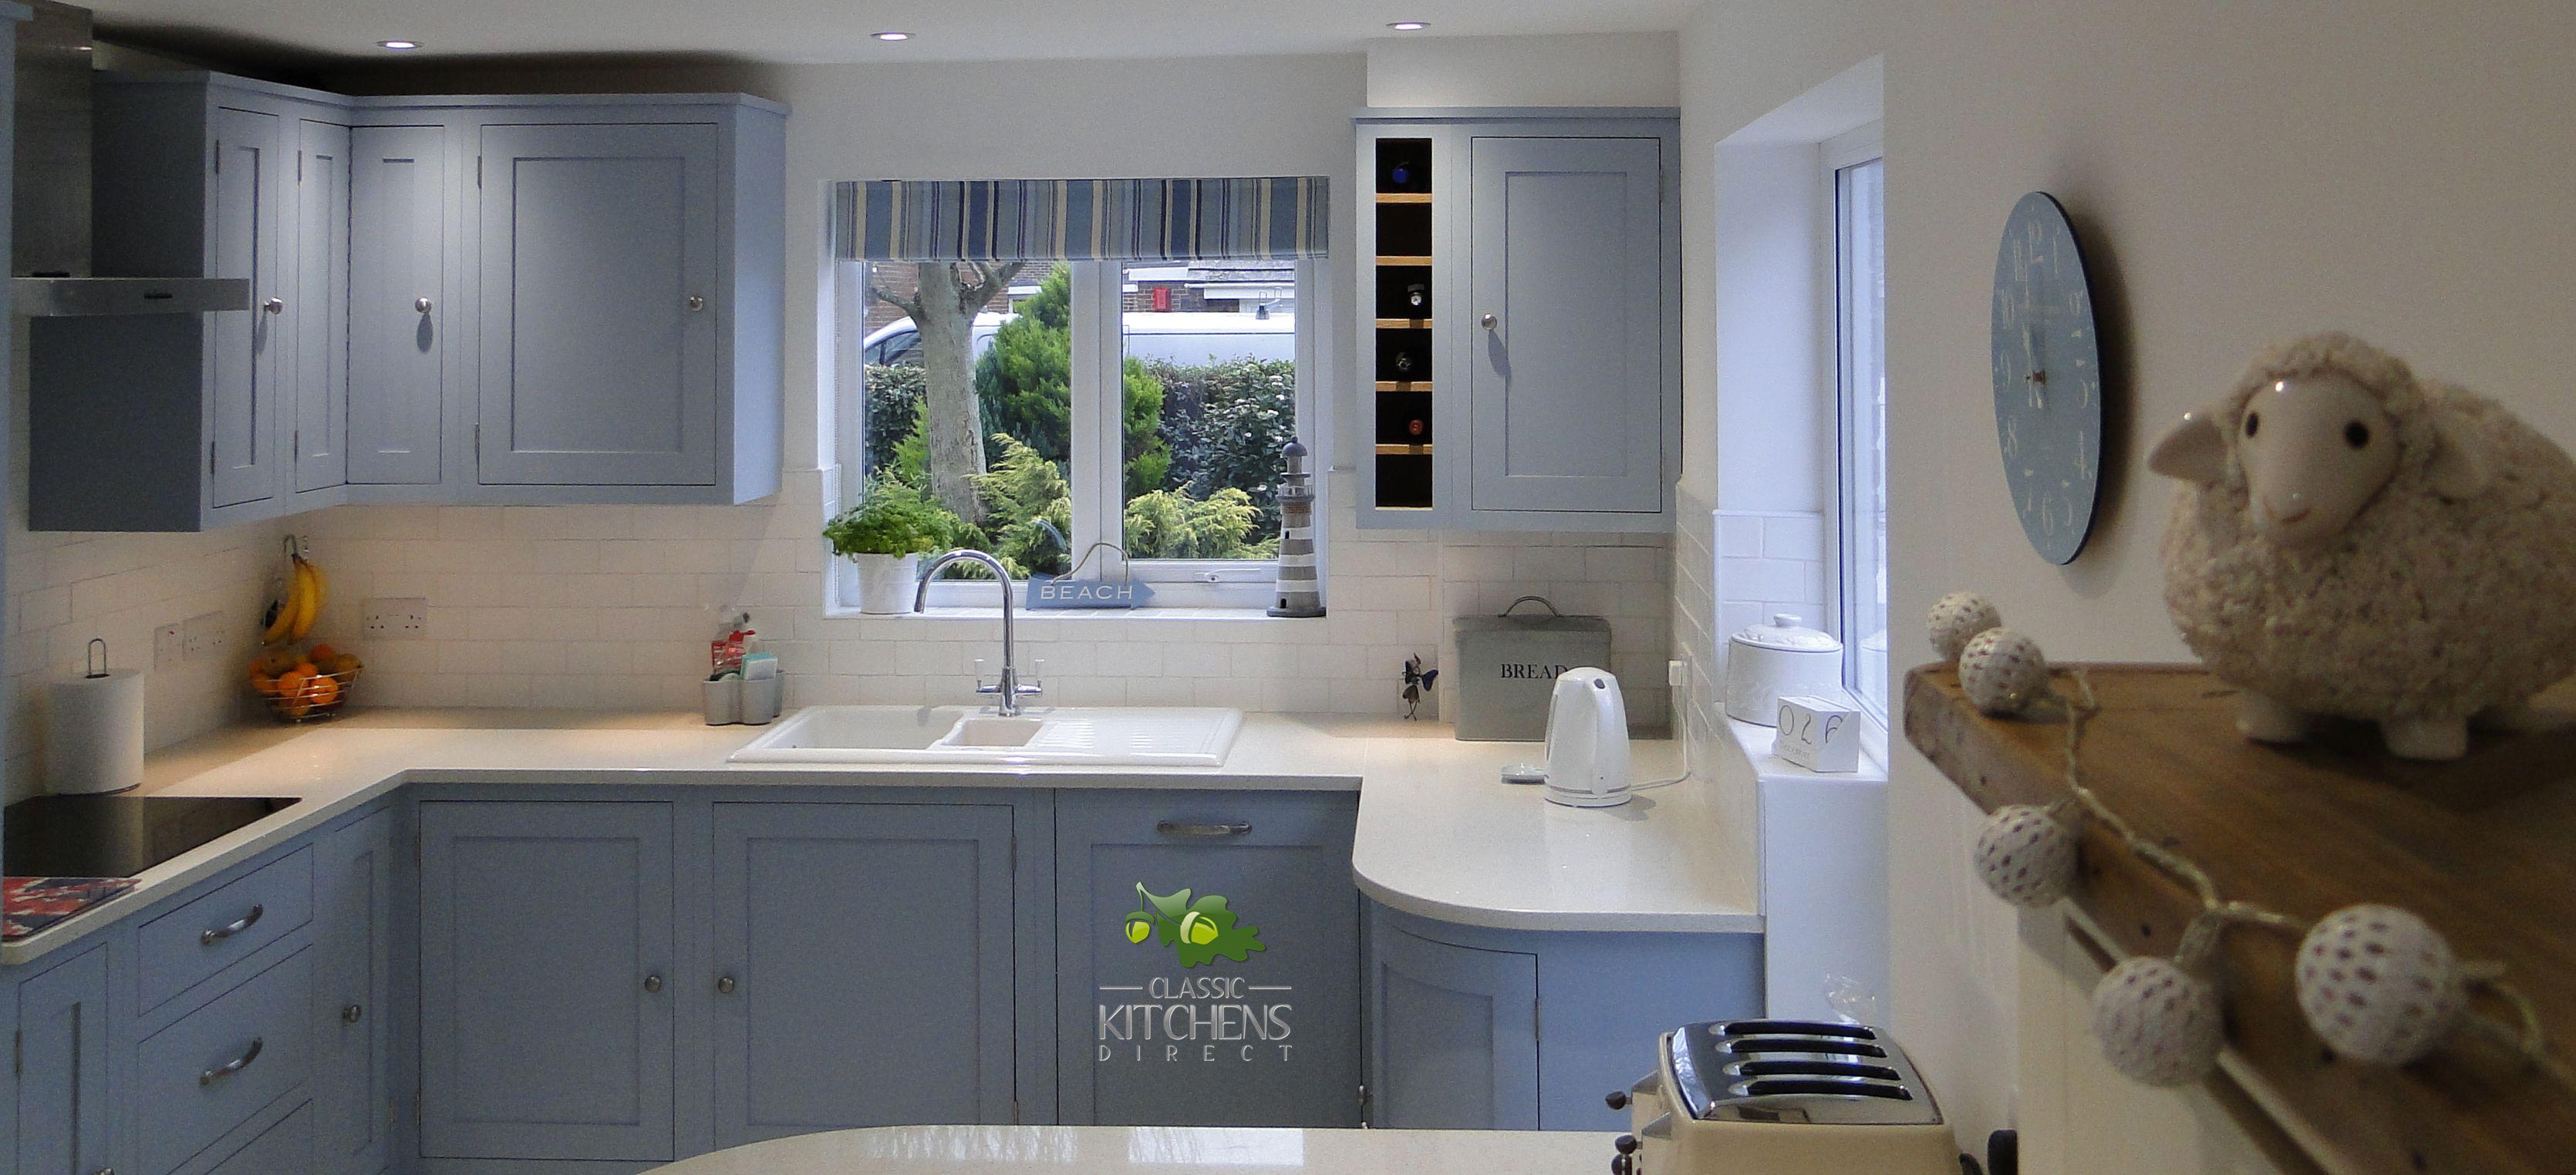 A Beautiful Handmade Kitchen In Parma Grey With Quartz Worktops Kitchens Christchurch